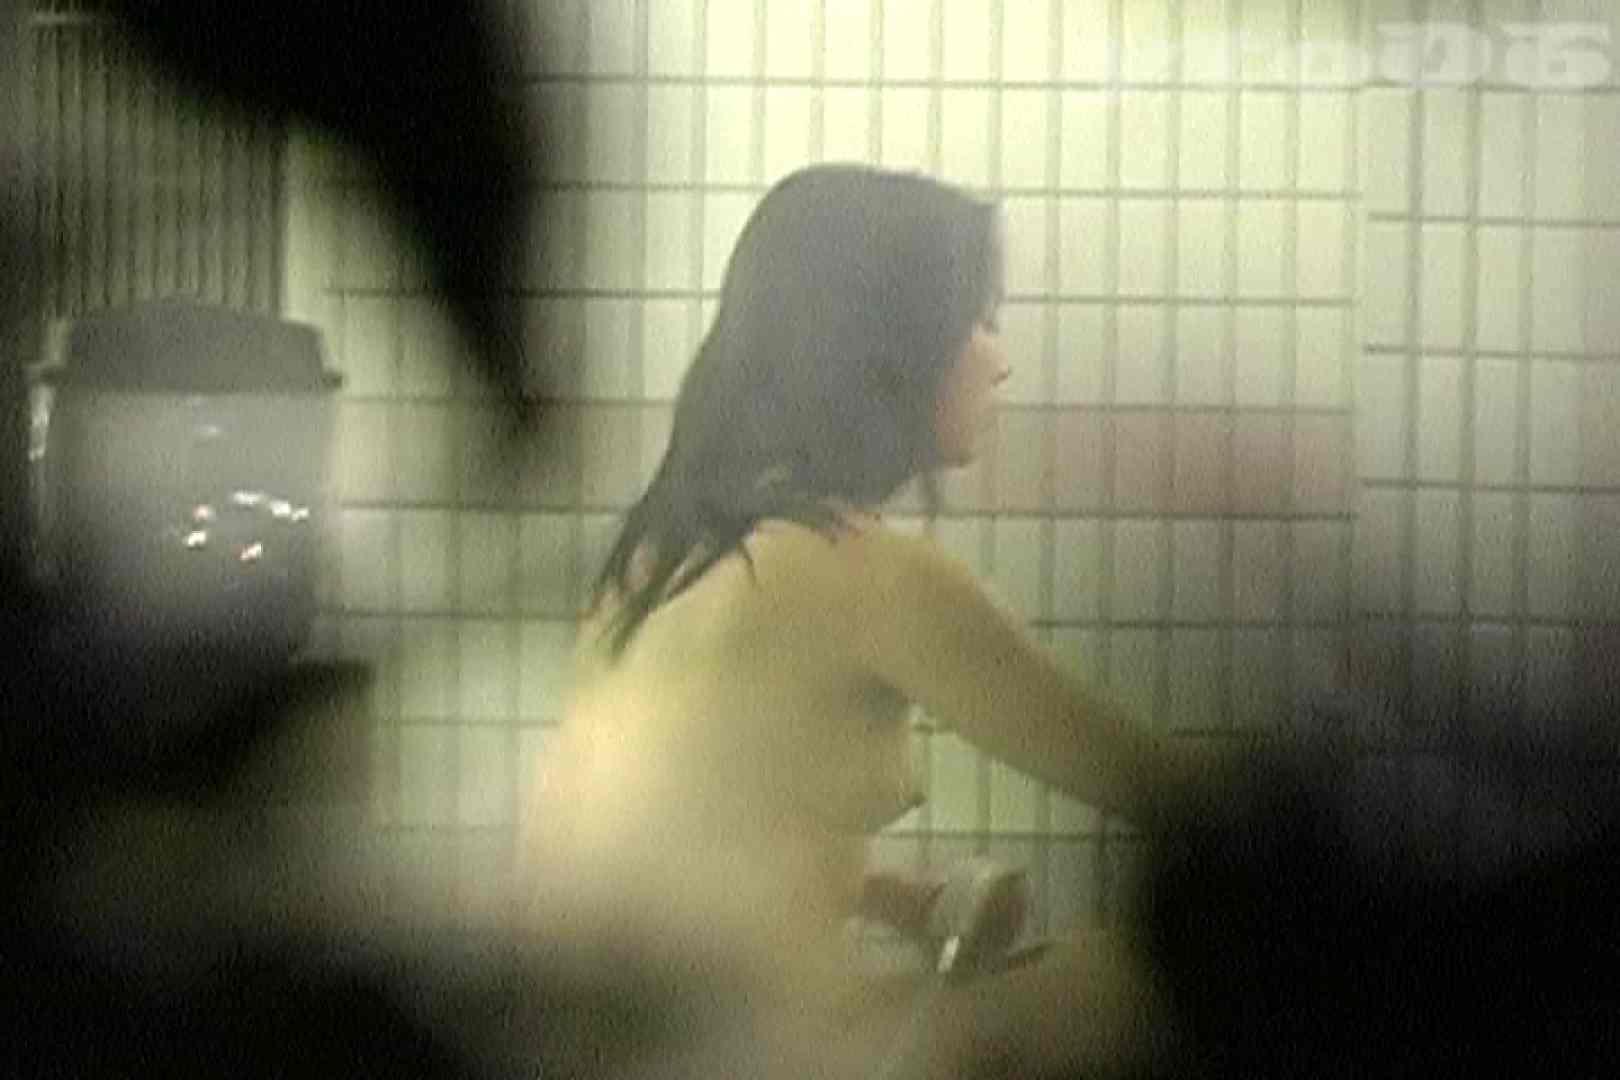 ▲復活限定▲合宿ホテル女風呂盗撮 Vol.36 盗撮 戯れ無修正画像 78PIX 2